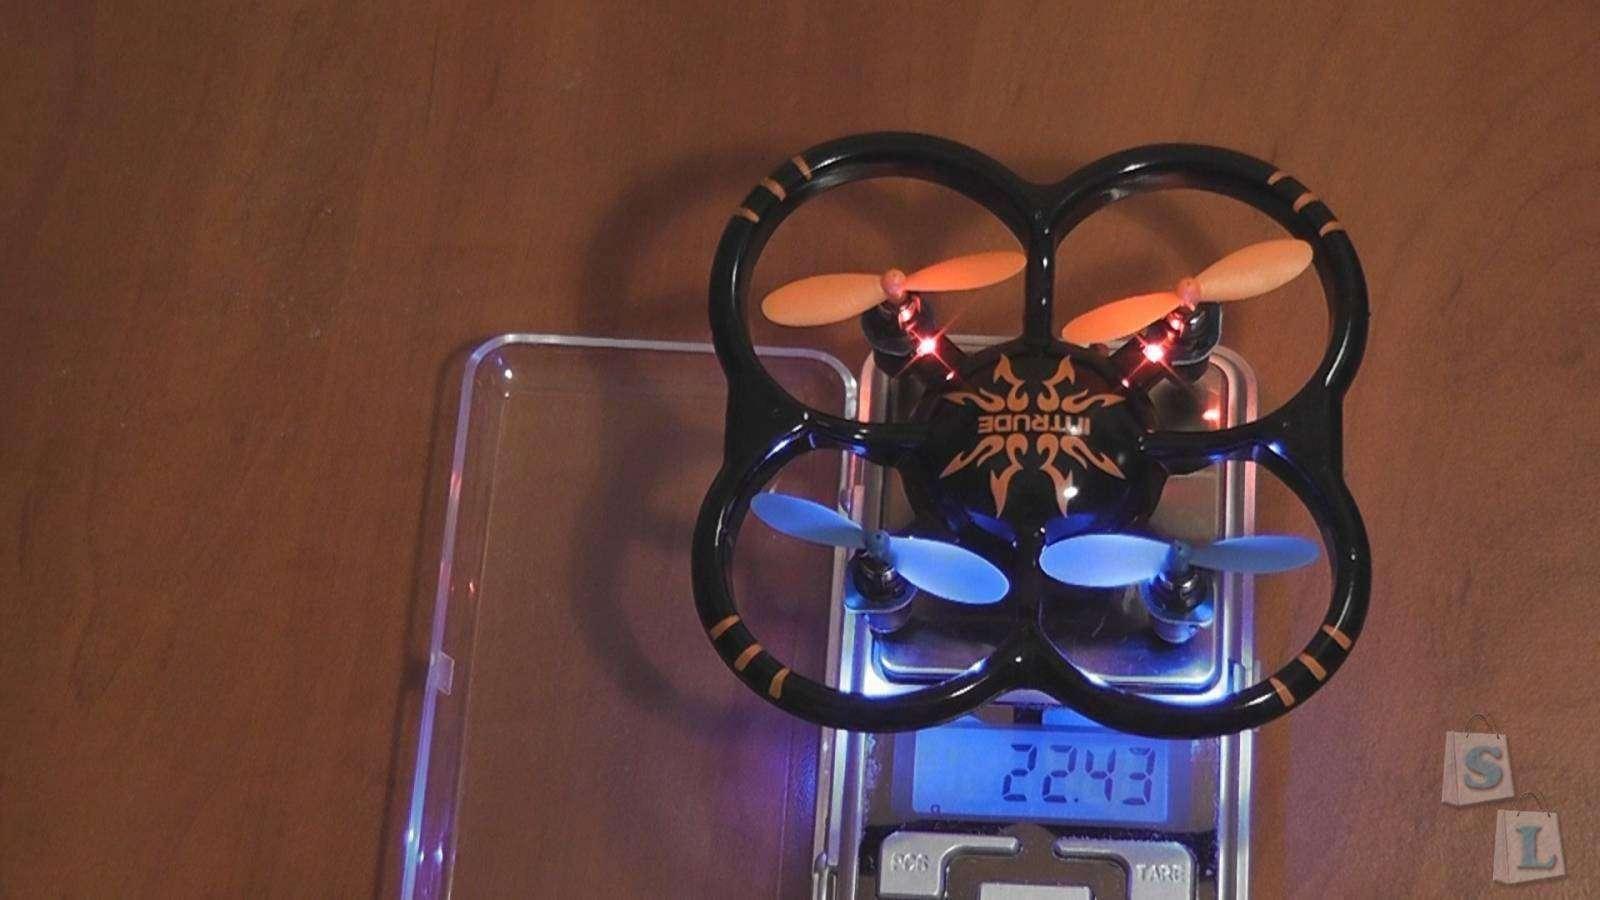 GearBest: NI HUI U207 'Intruder' 2.4GHz, 4Ch, 6 Axis Gyro, mini RC Quadcopter (RTF)